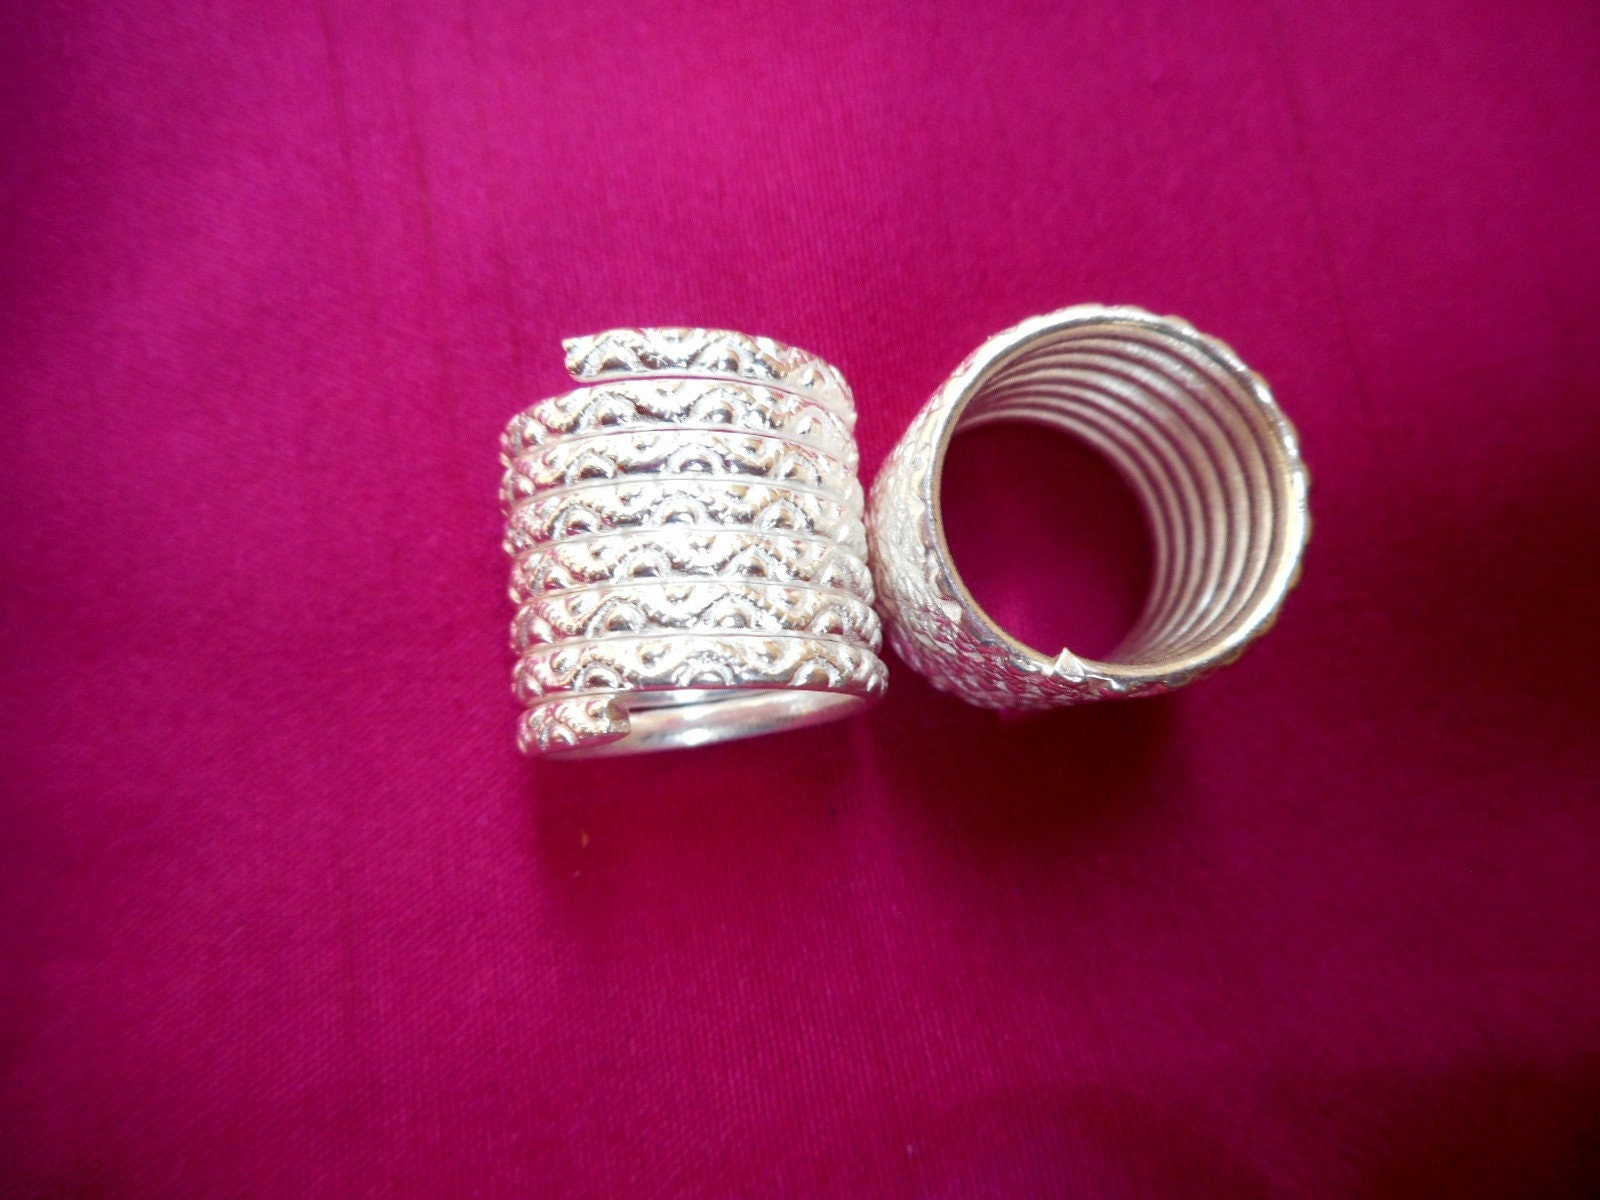 Big Coil Toe ring Adjustable Sterling Silver Spiral Toe Ring | Etsy